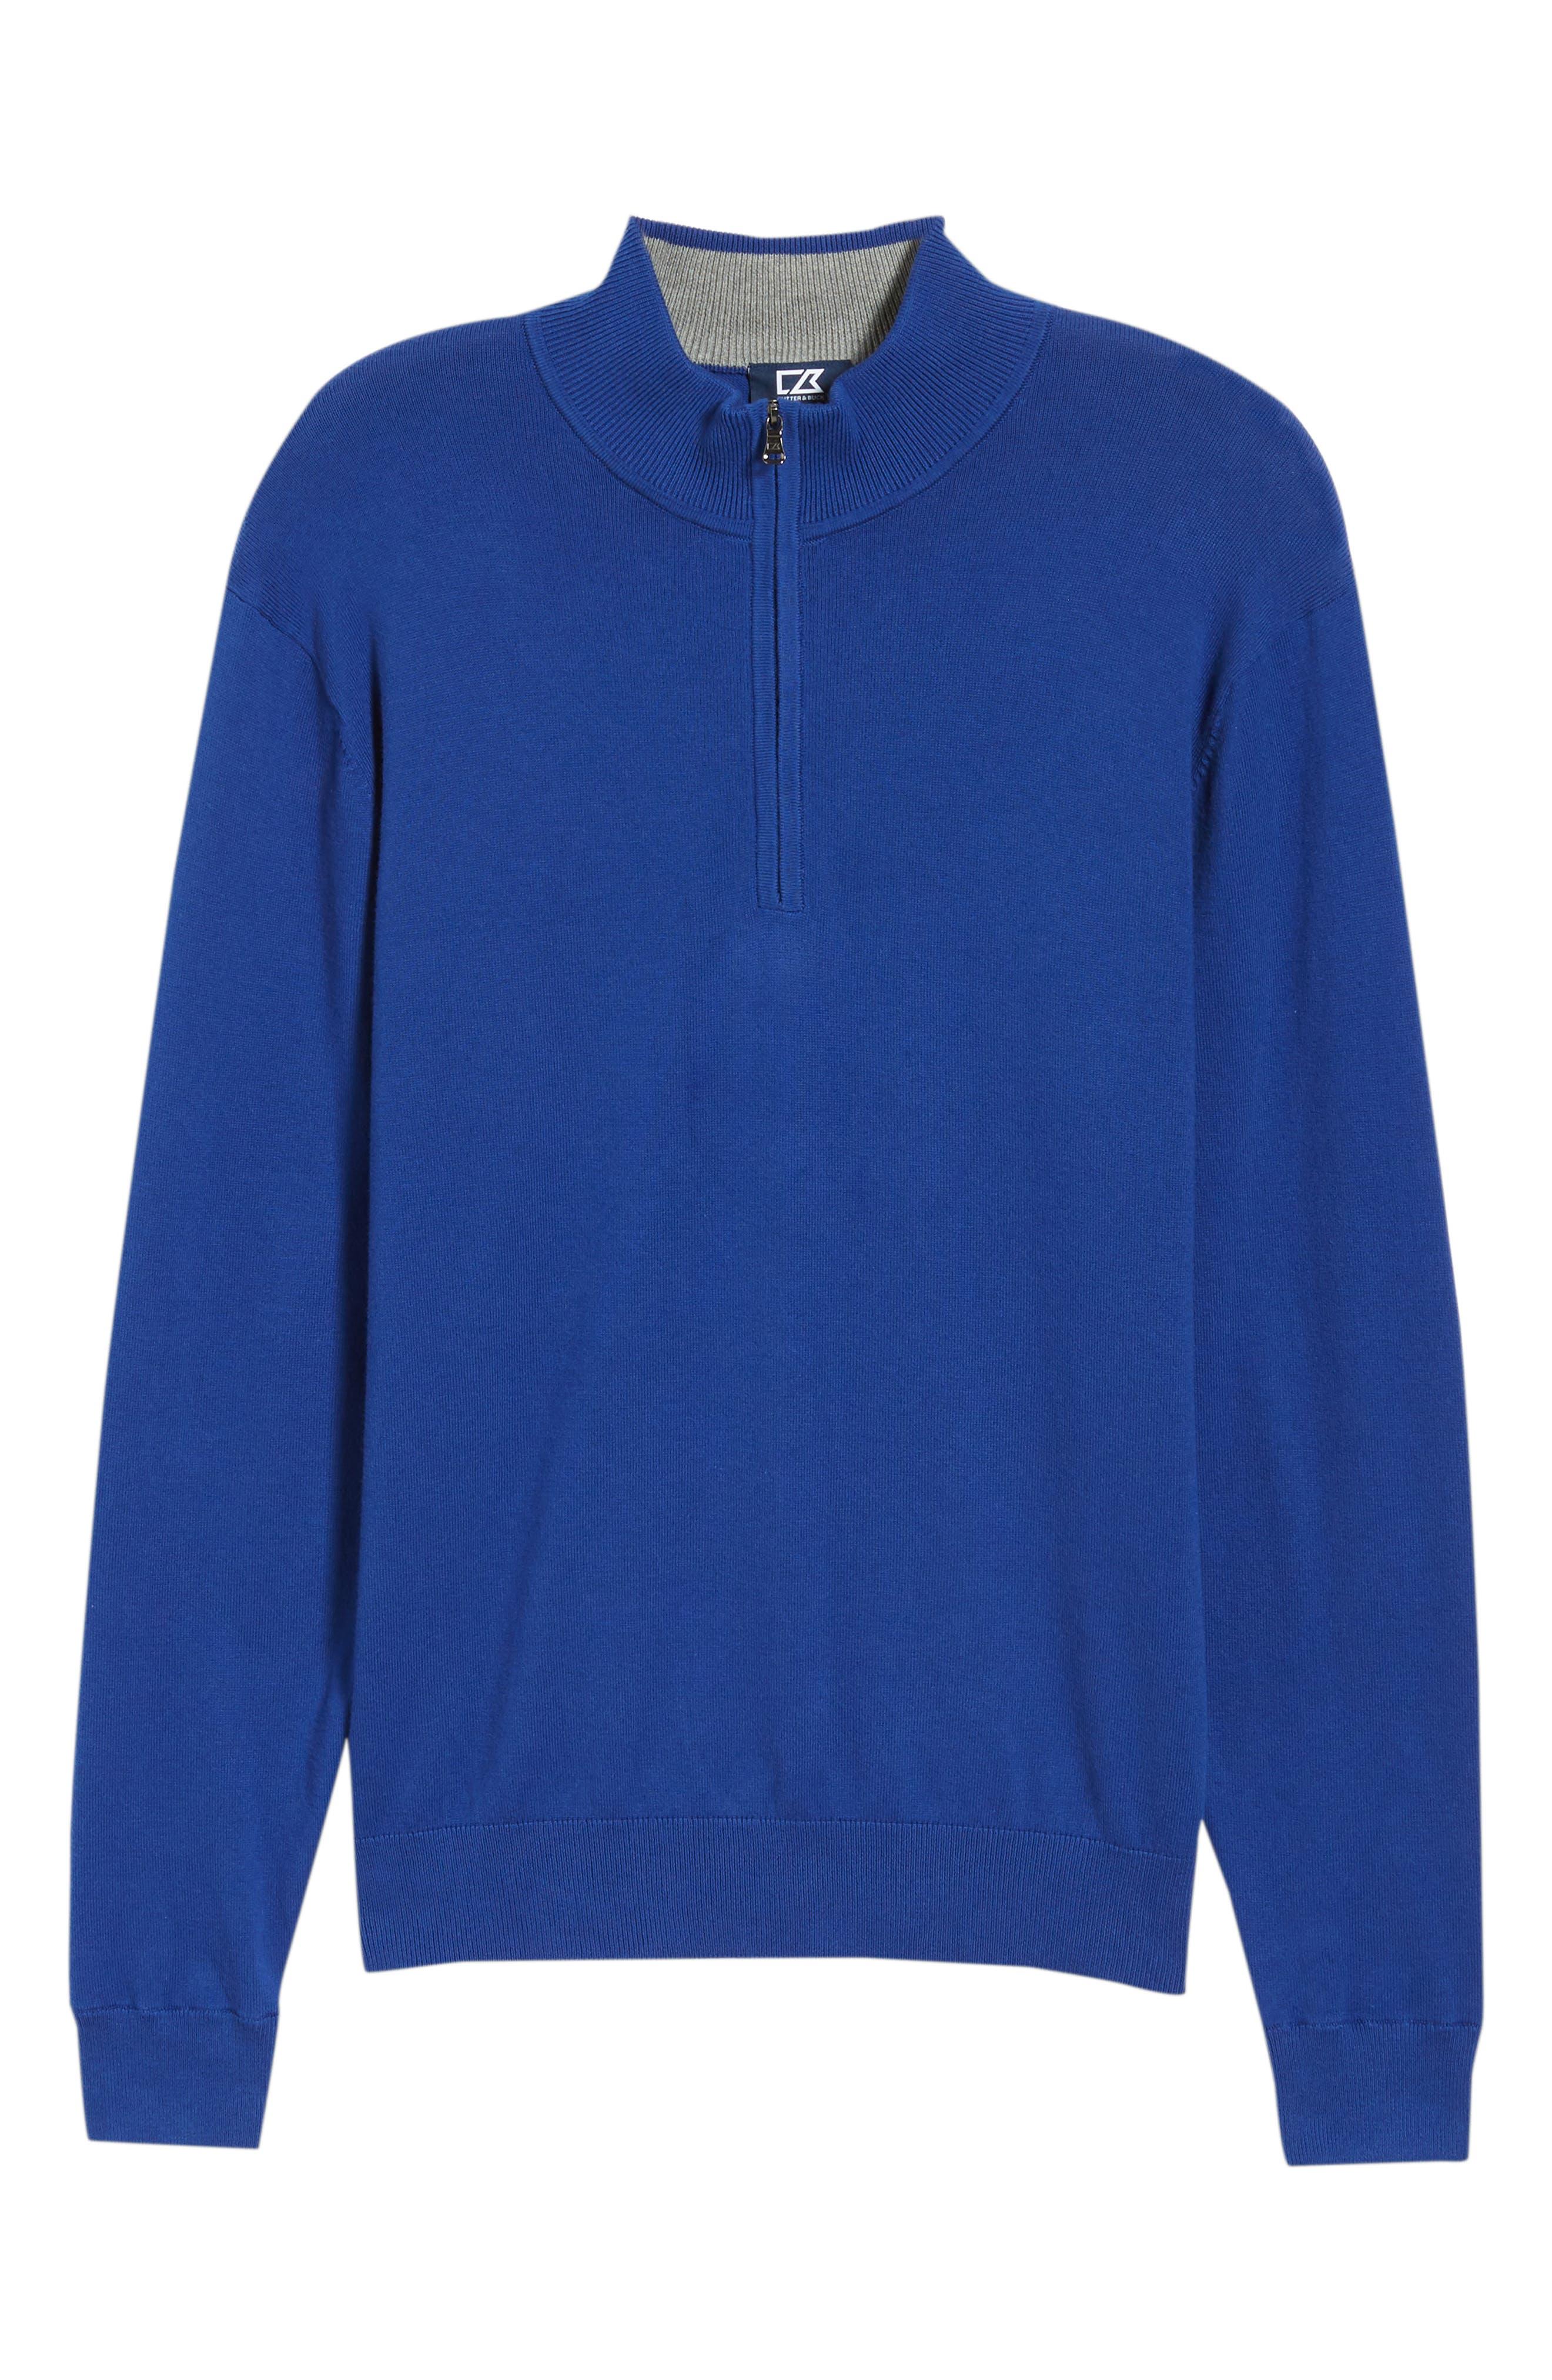 CUTTER & BUCK, Lakemont Half Zip Sweater, Alternate thumbnail 6, color, 419